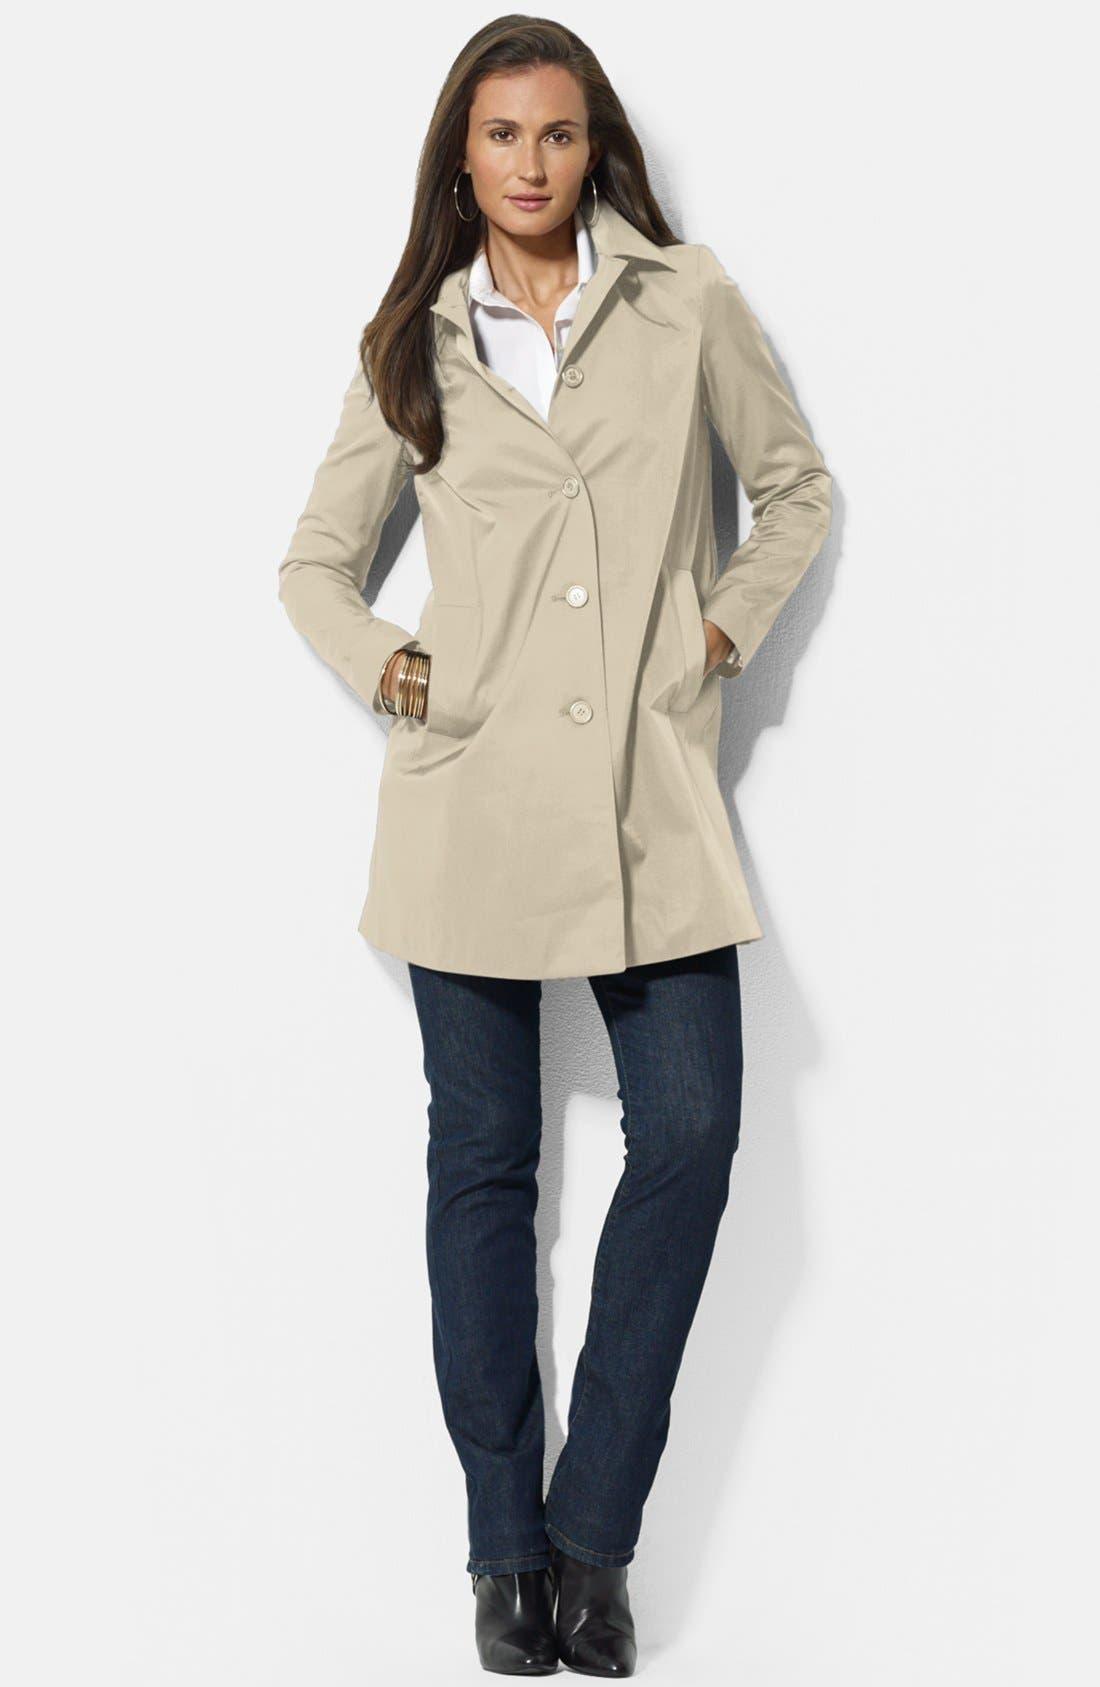 Alternate Image 1 Selected - Lauren Ralph Lauren Bonded Cotton A-Line Jacket with Detachable Hood